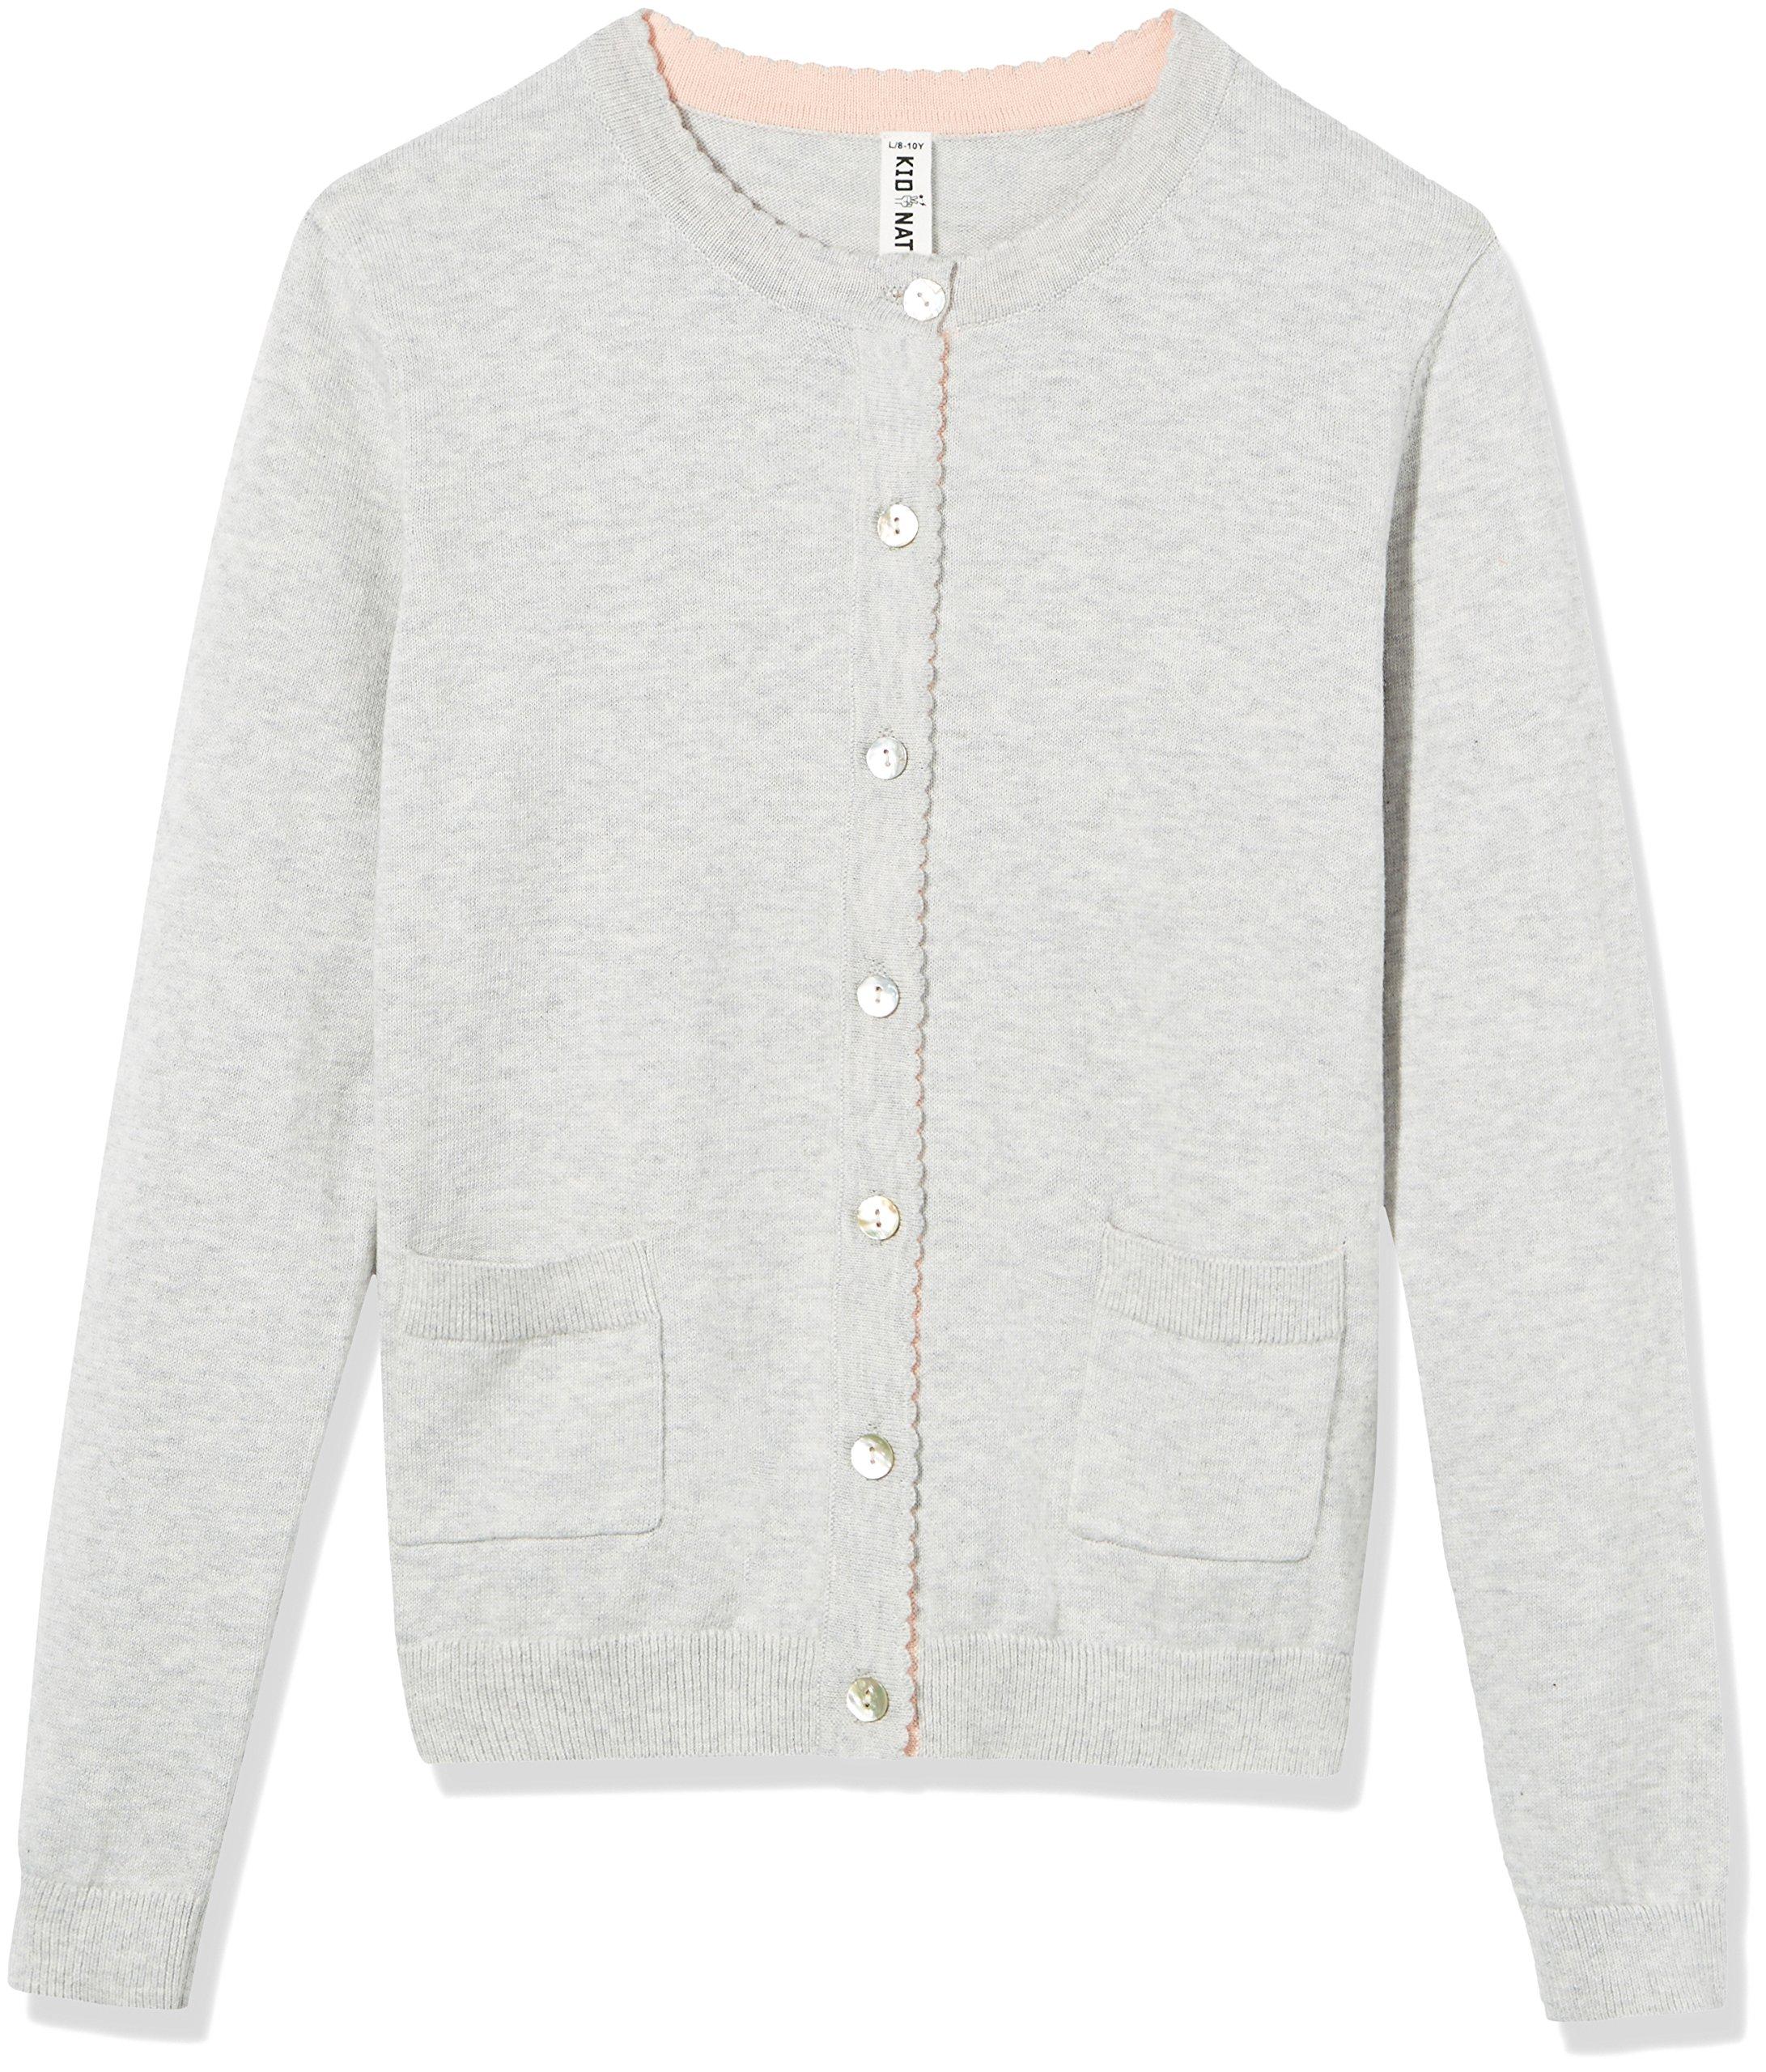 Kid Nation Girls' Long Sleeve Cardigan Sweater Classic with Pocket XS Light Grey